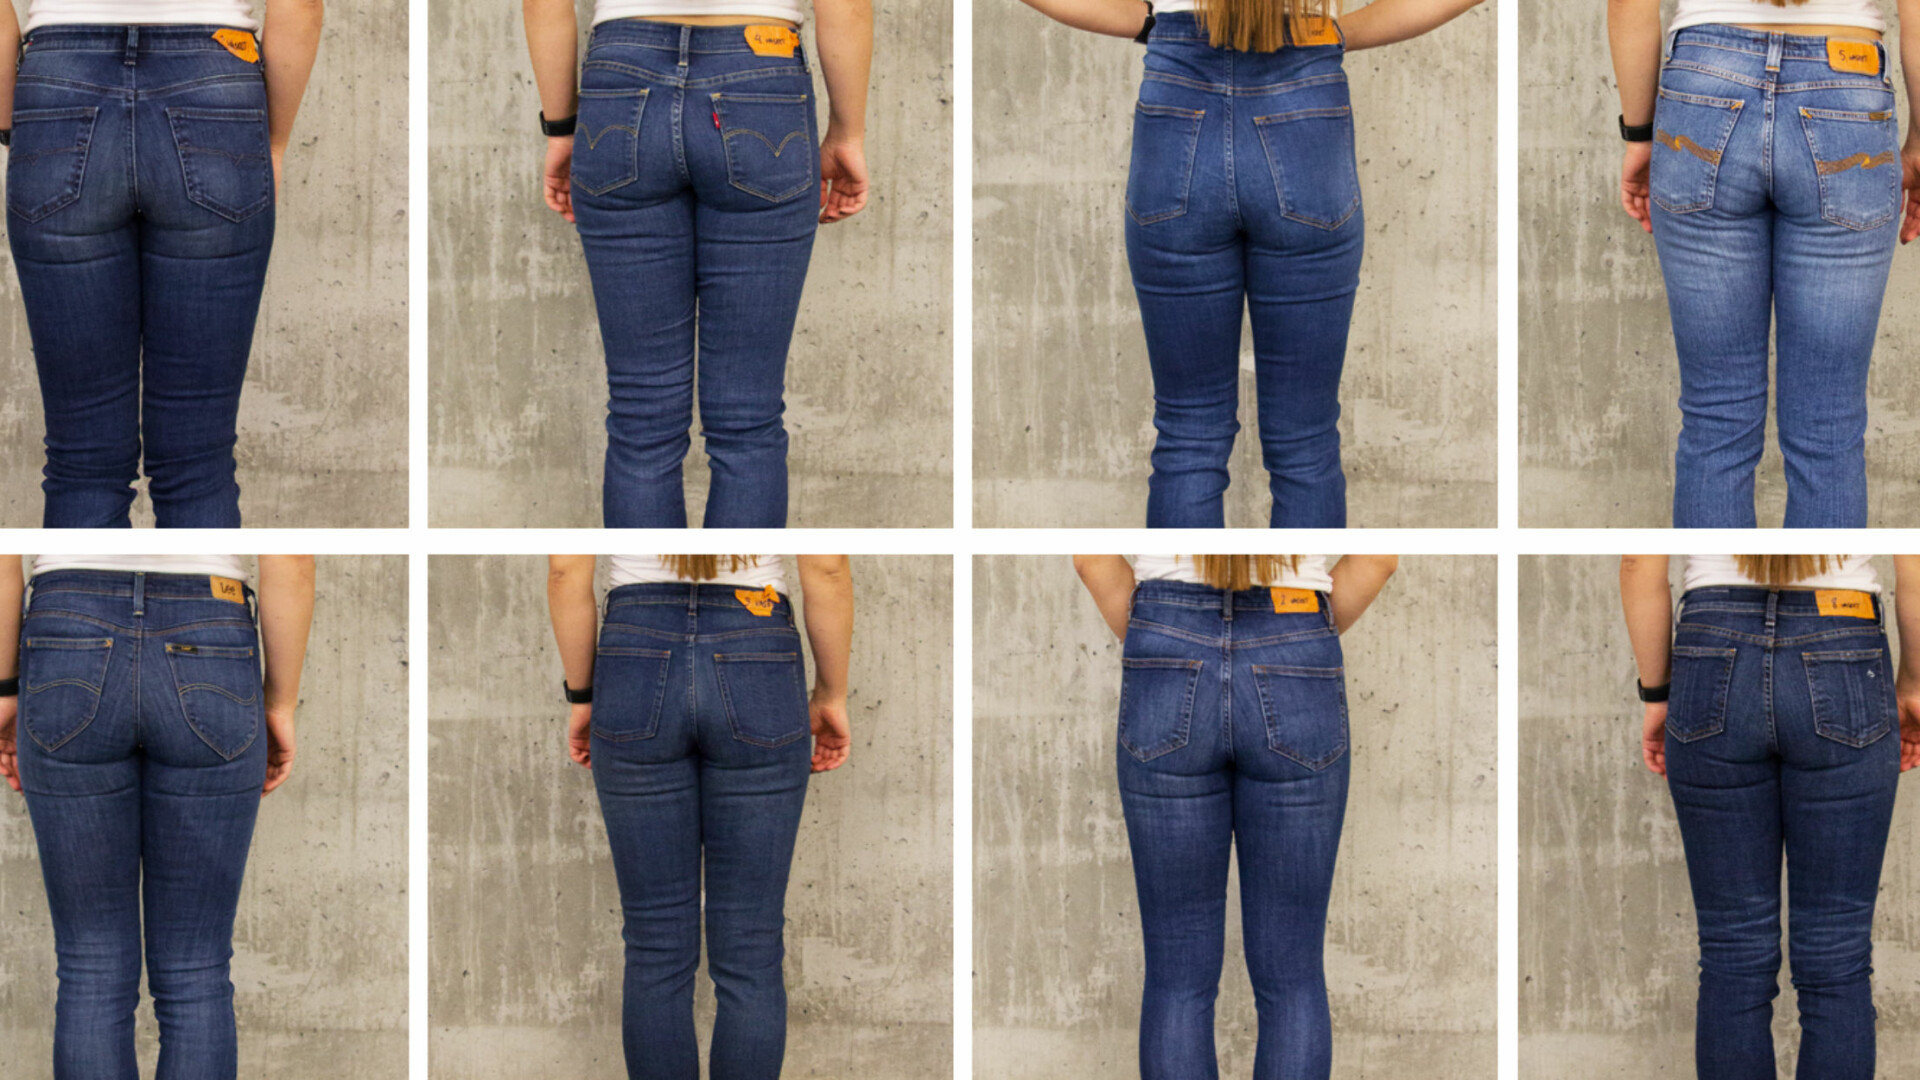 ddaca933 Test av stretch-jeans - Mote